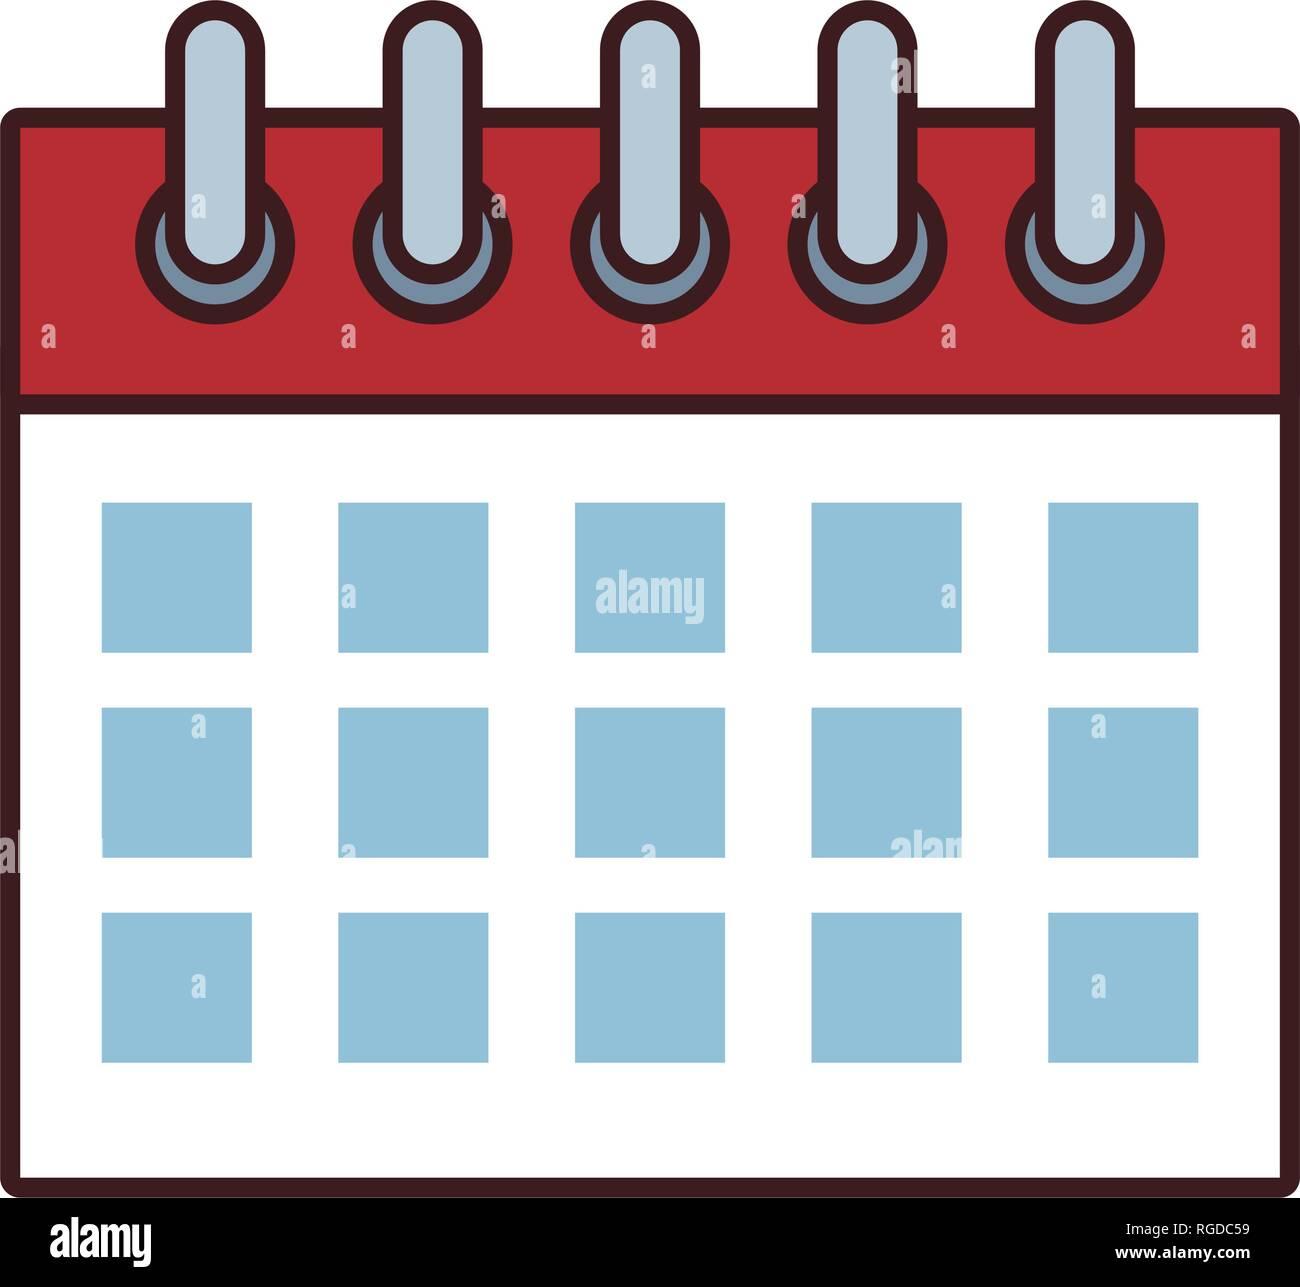 date calendar cartoon stock vector image art alamy https www alamy com date calendar cartoon image233864213 html